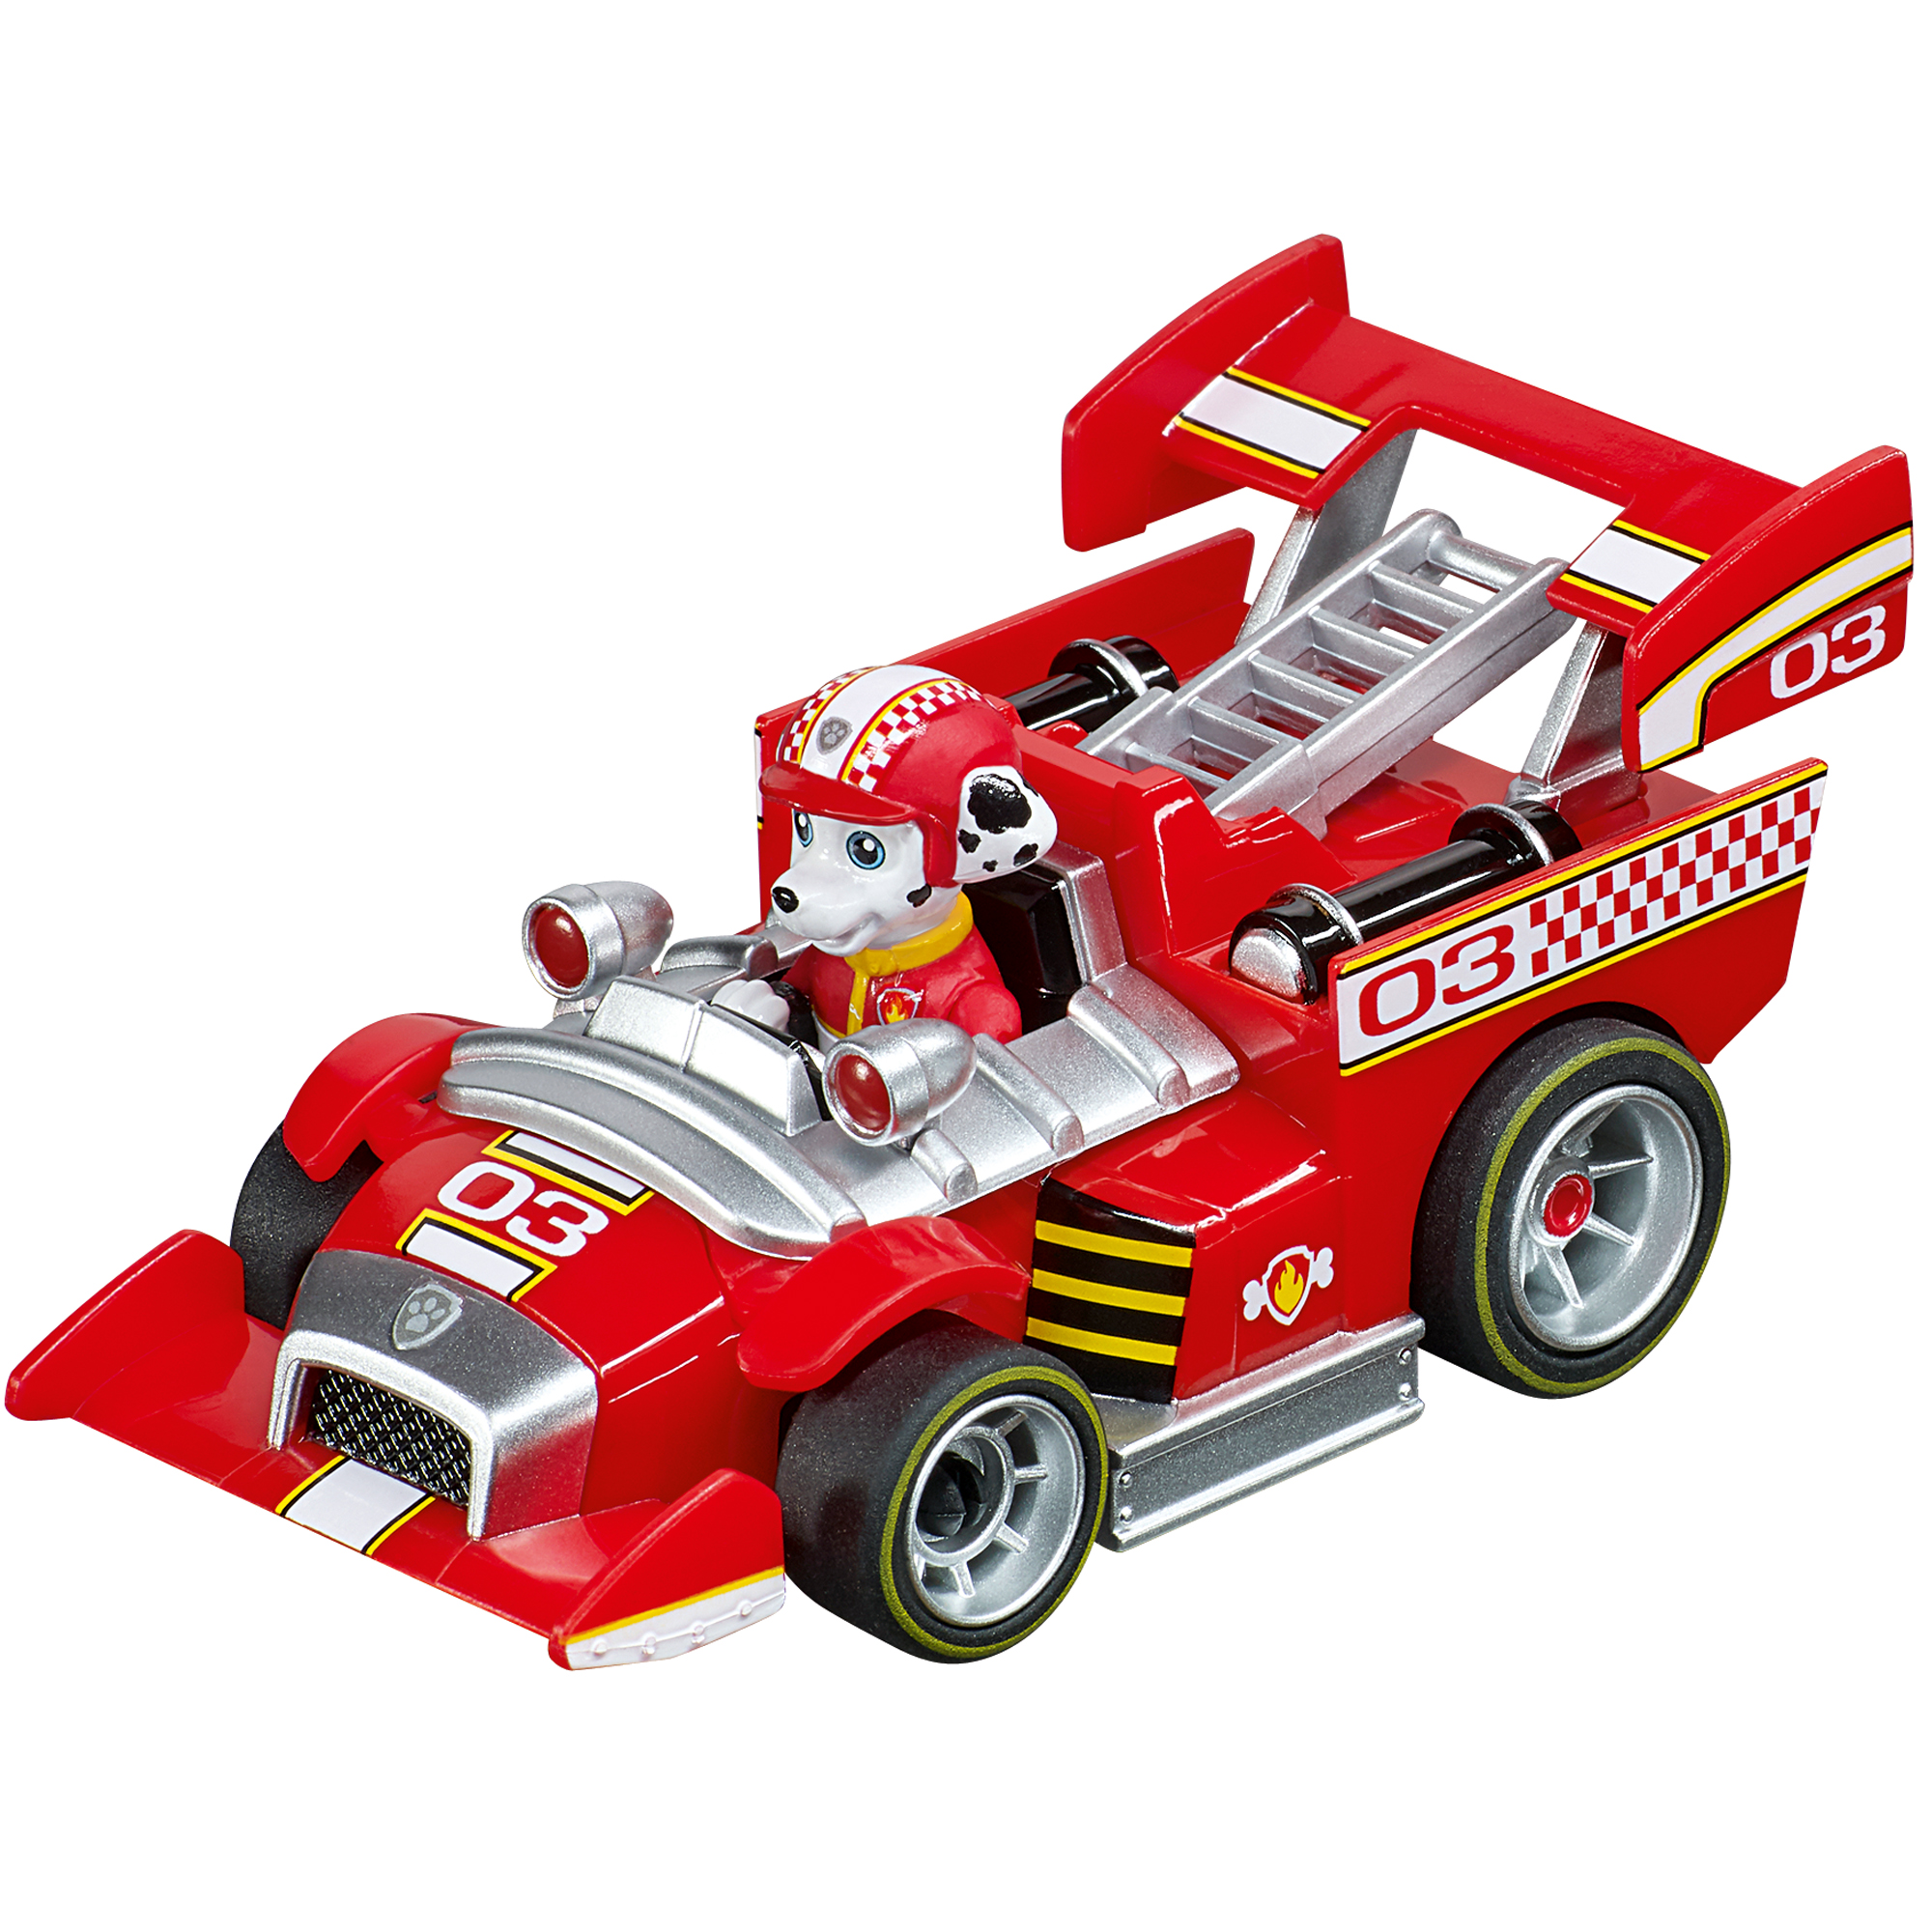 Carrera - GO!!! Car - PAW Patrol - Ready Race Rescue - Marshall (20064176)